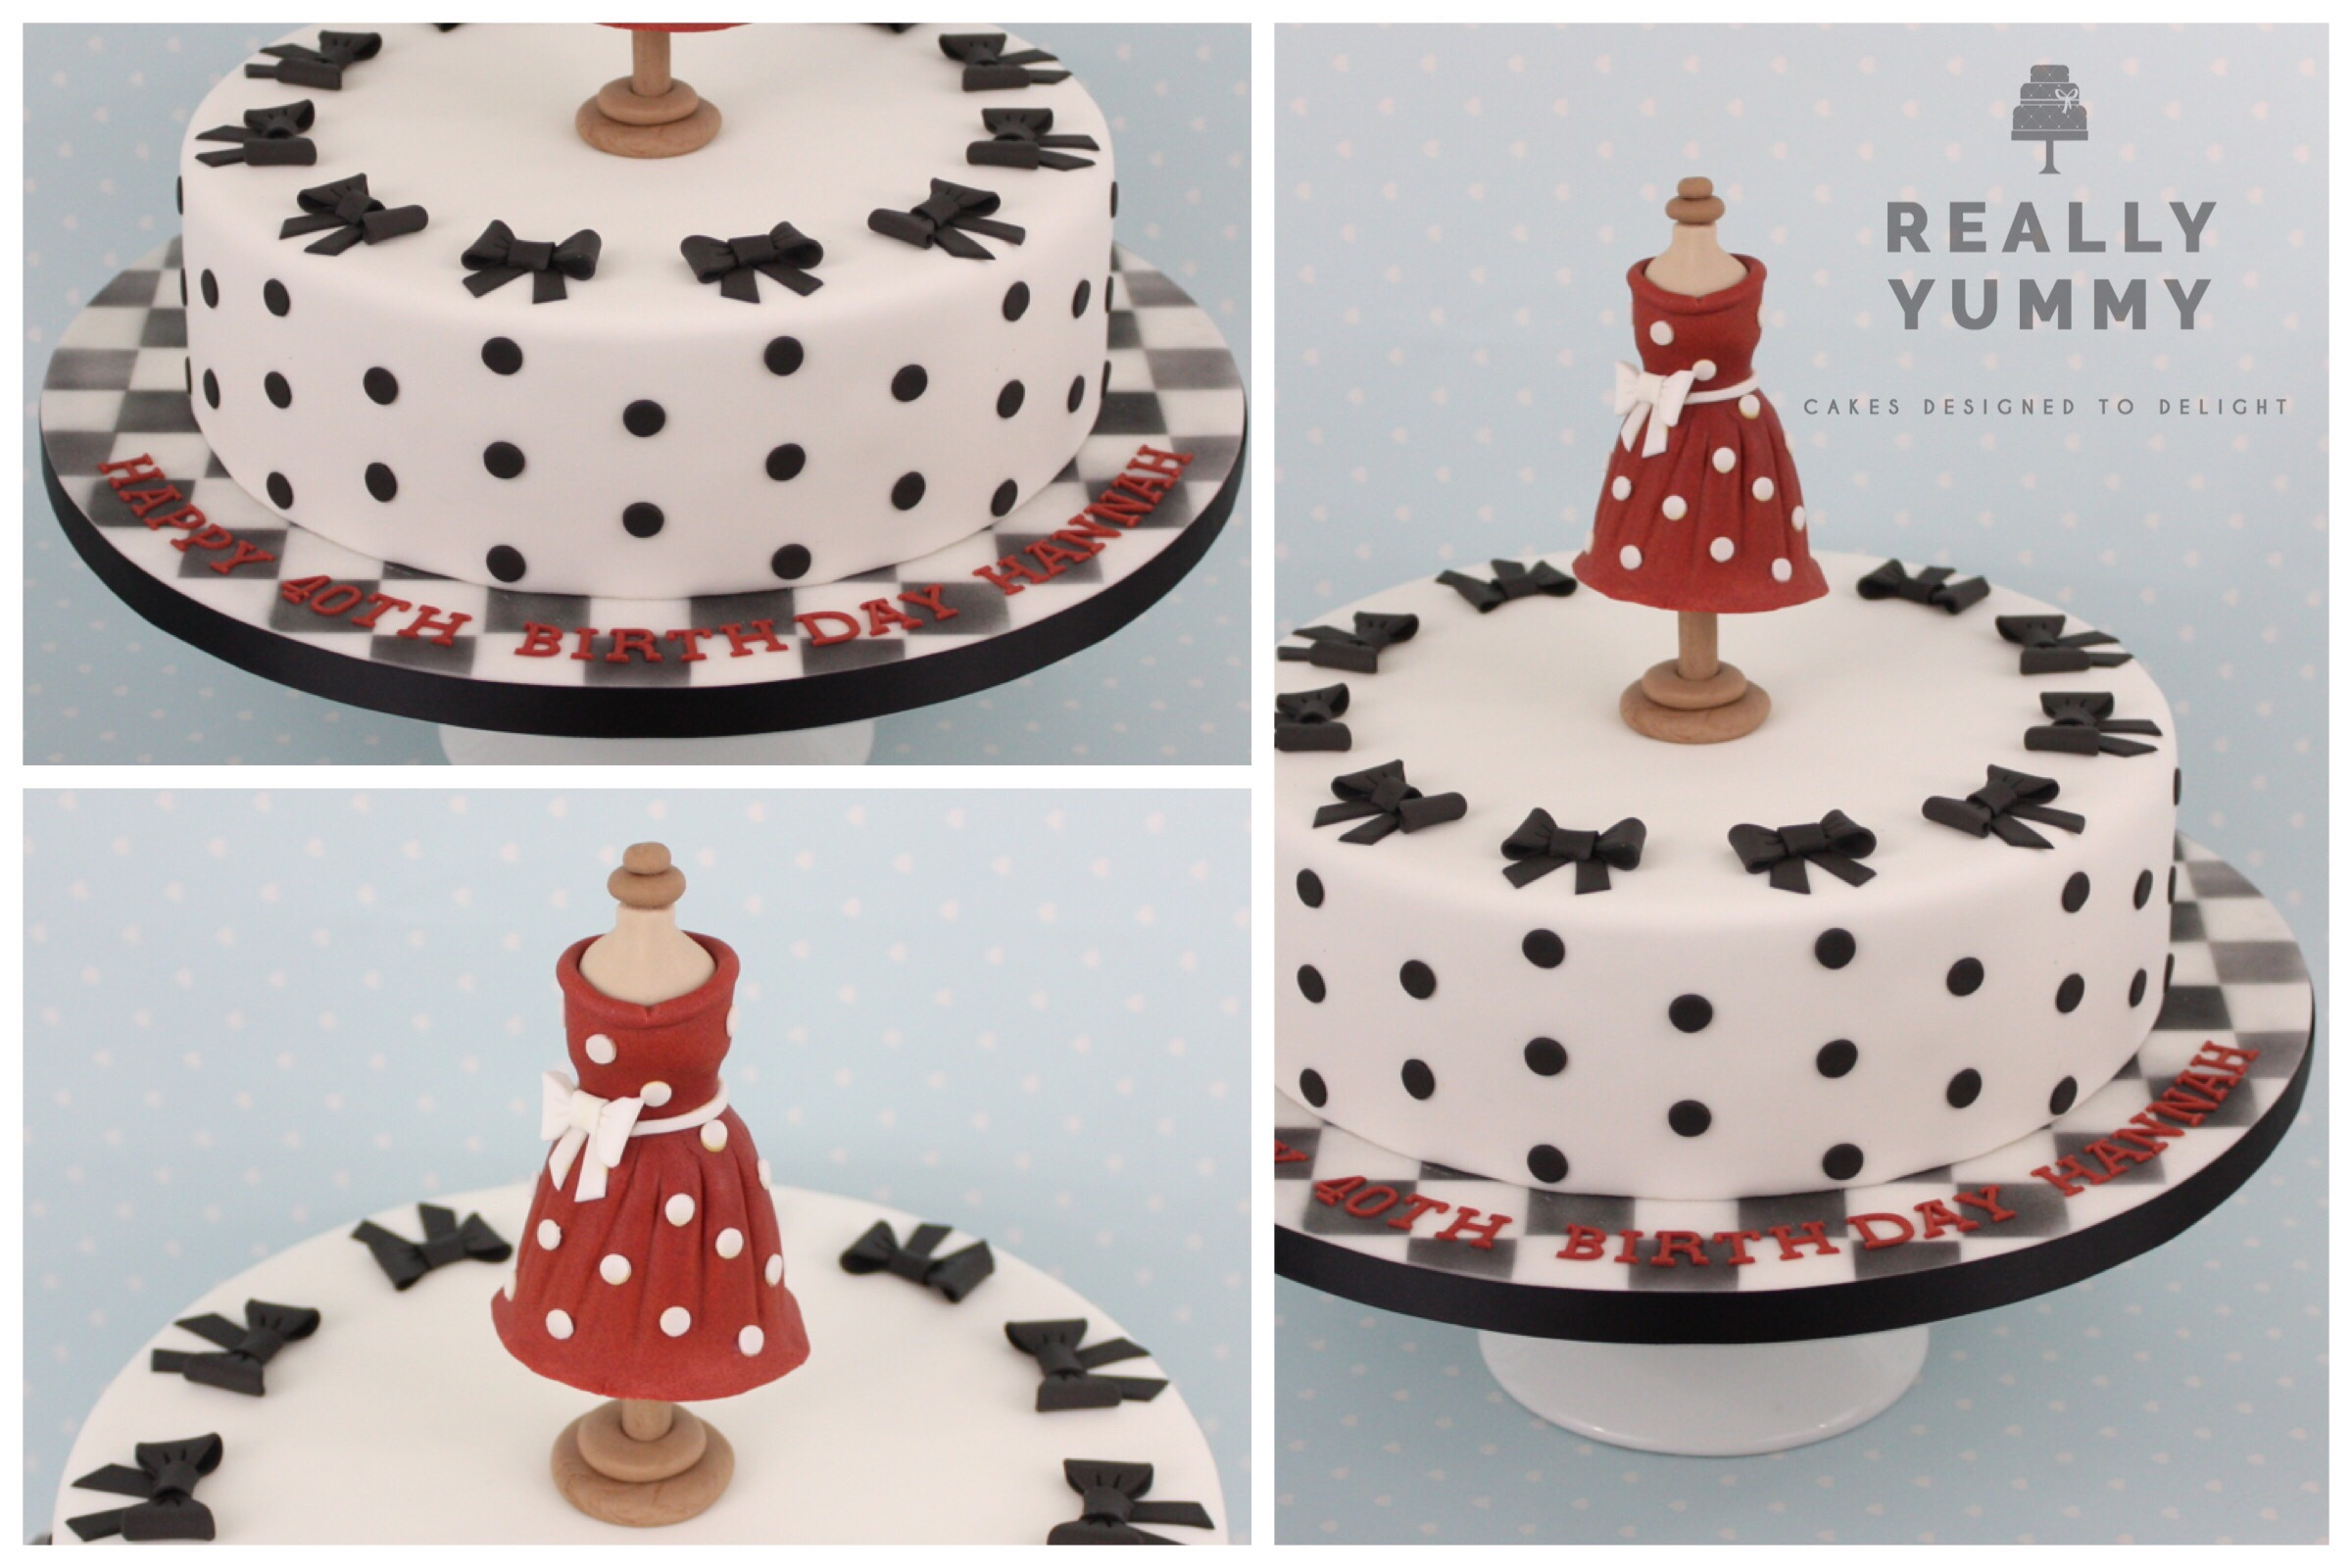 Dressmaker's dummy cake